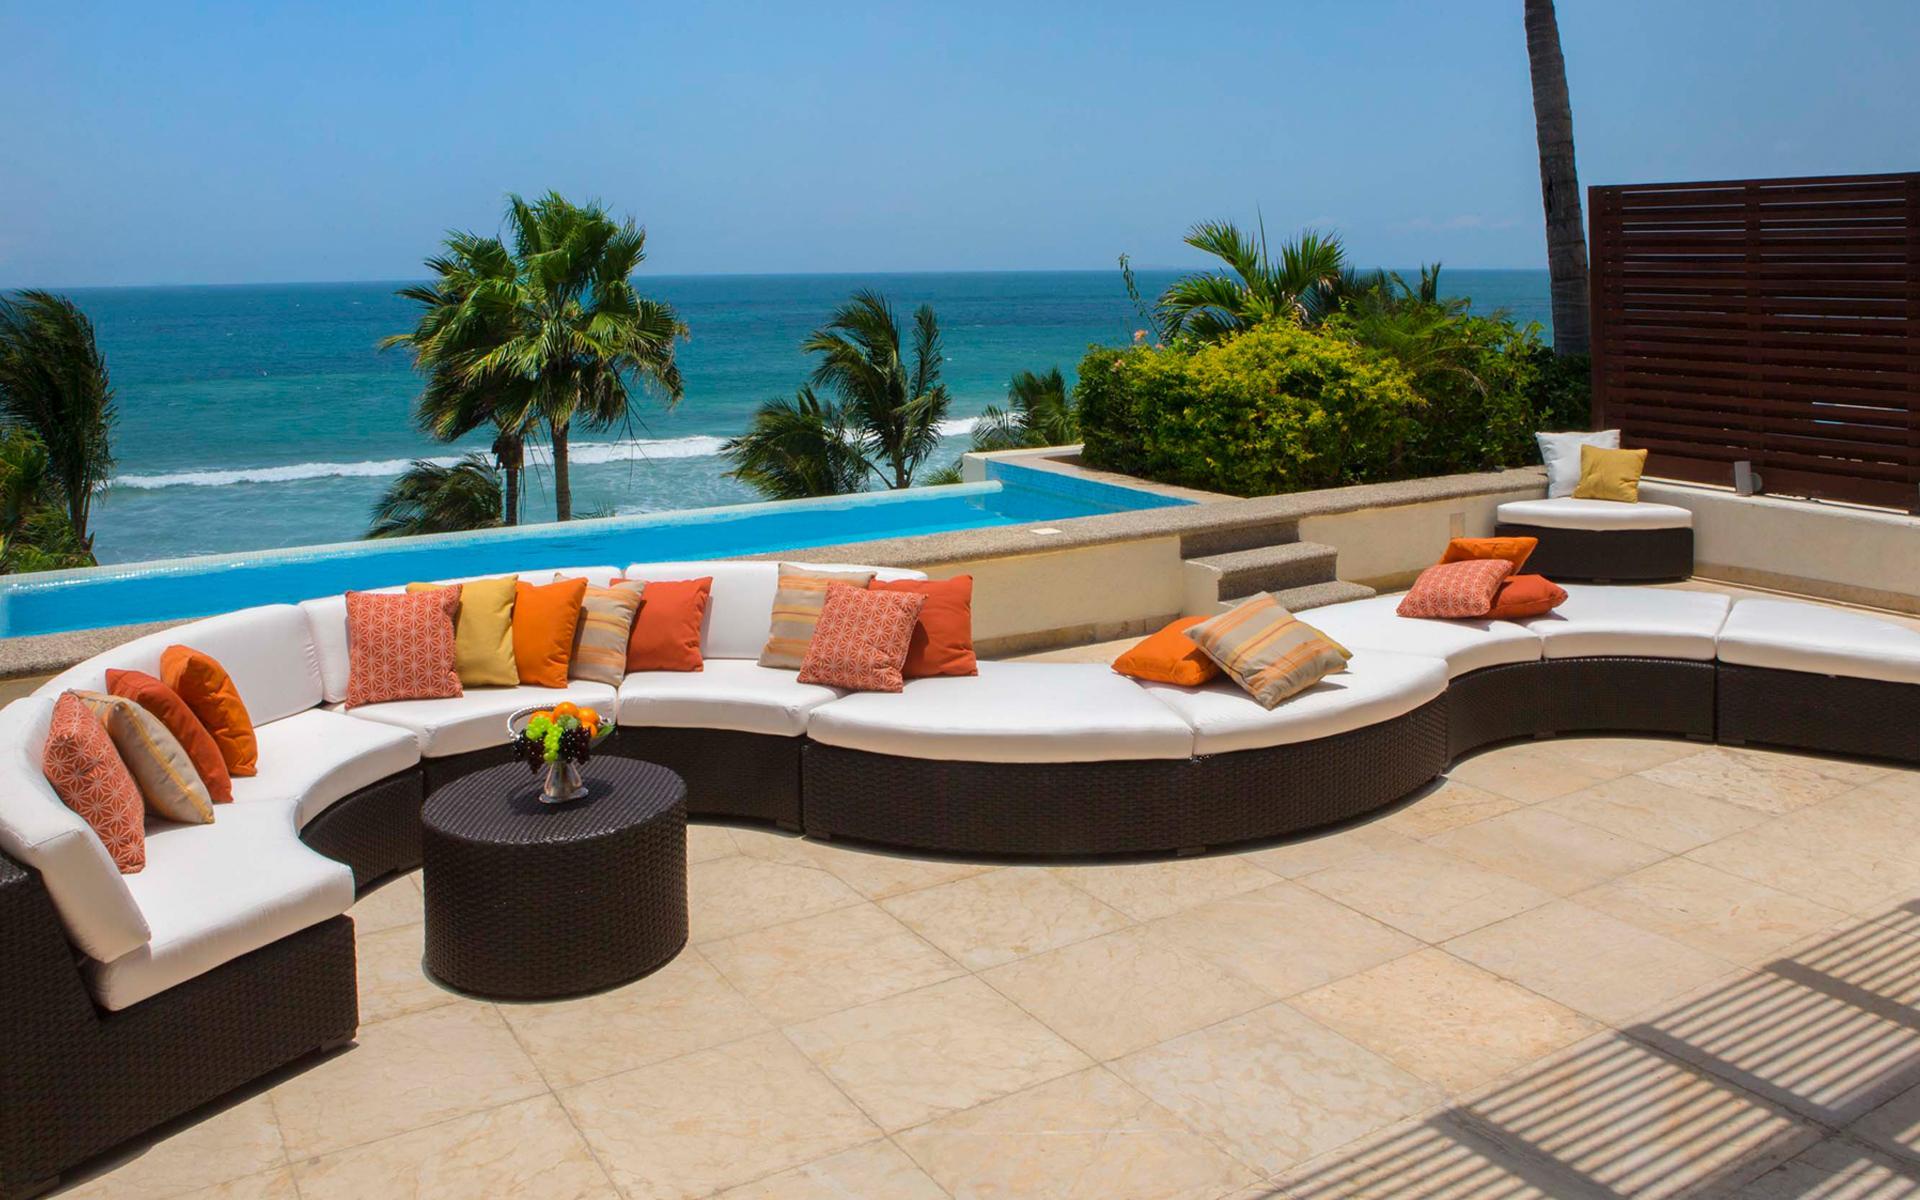 patio interesting outdoor pool furniture outdoor pool furniture poolside  furniture GSEUUDZ